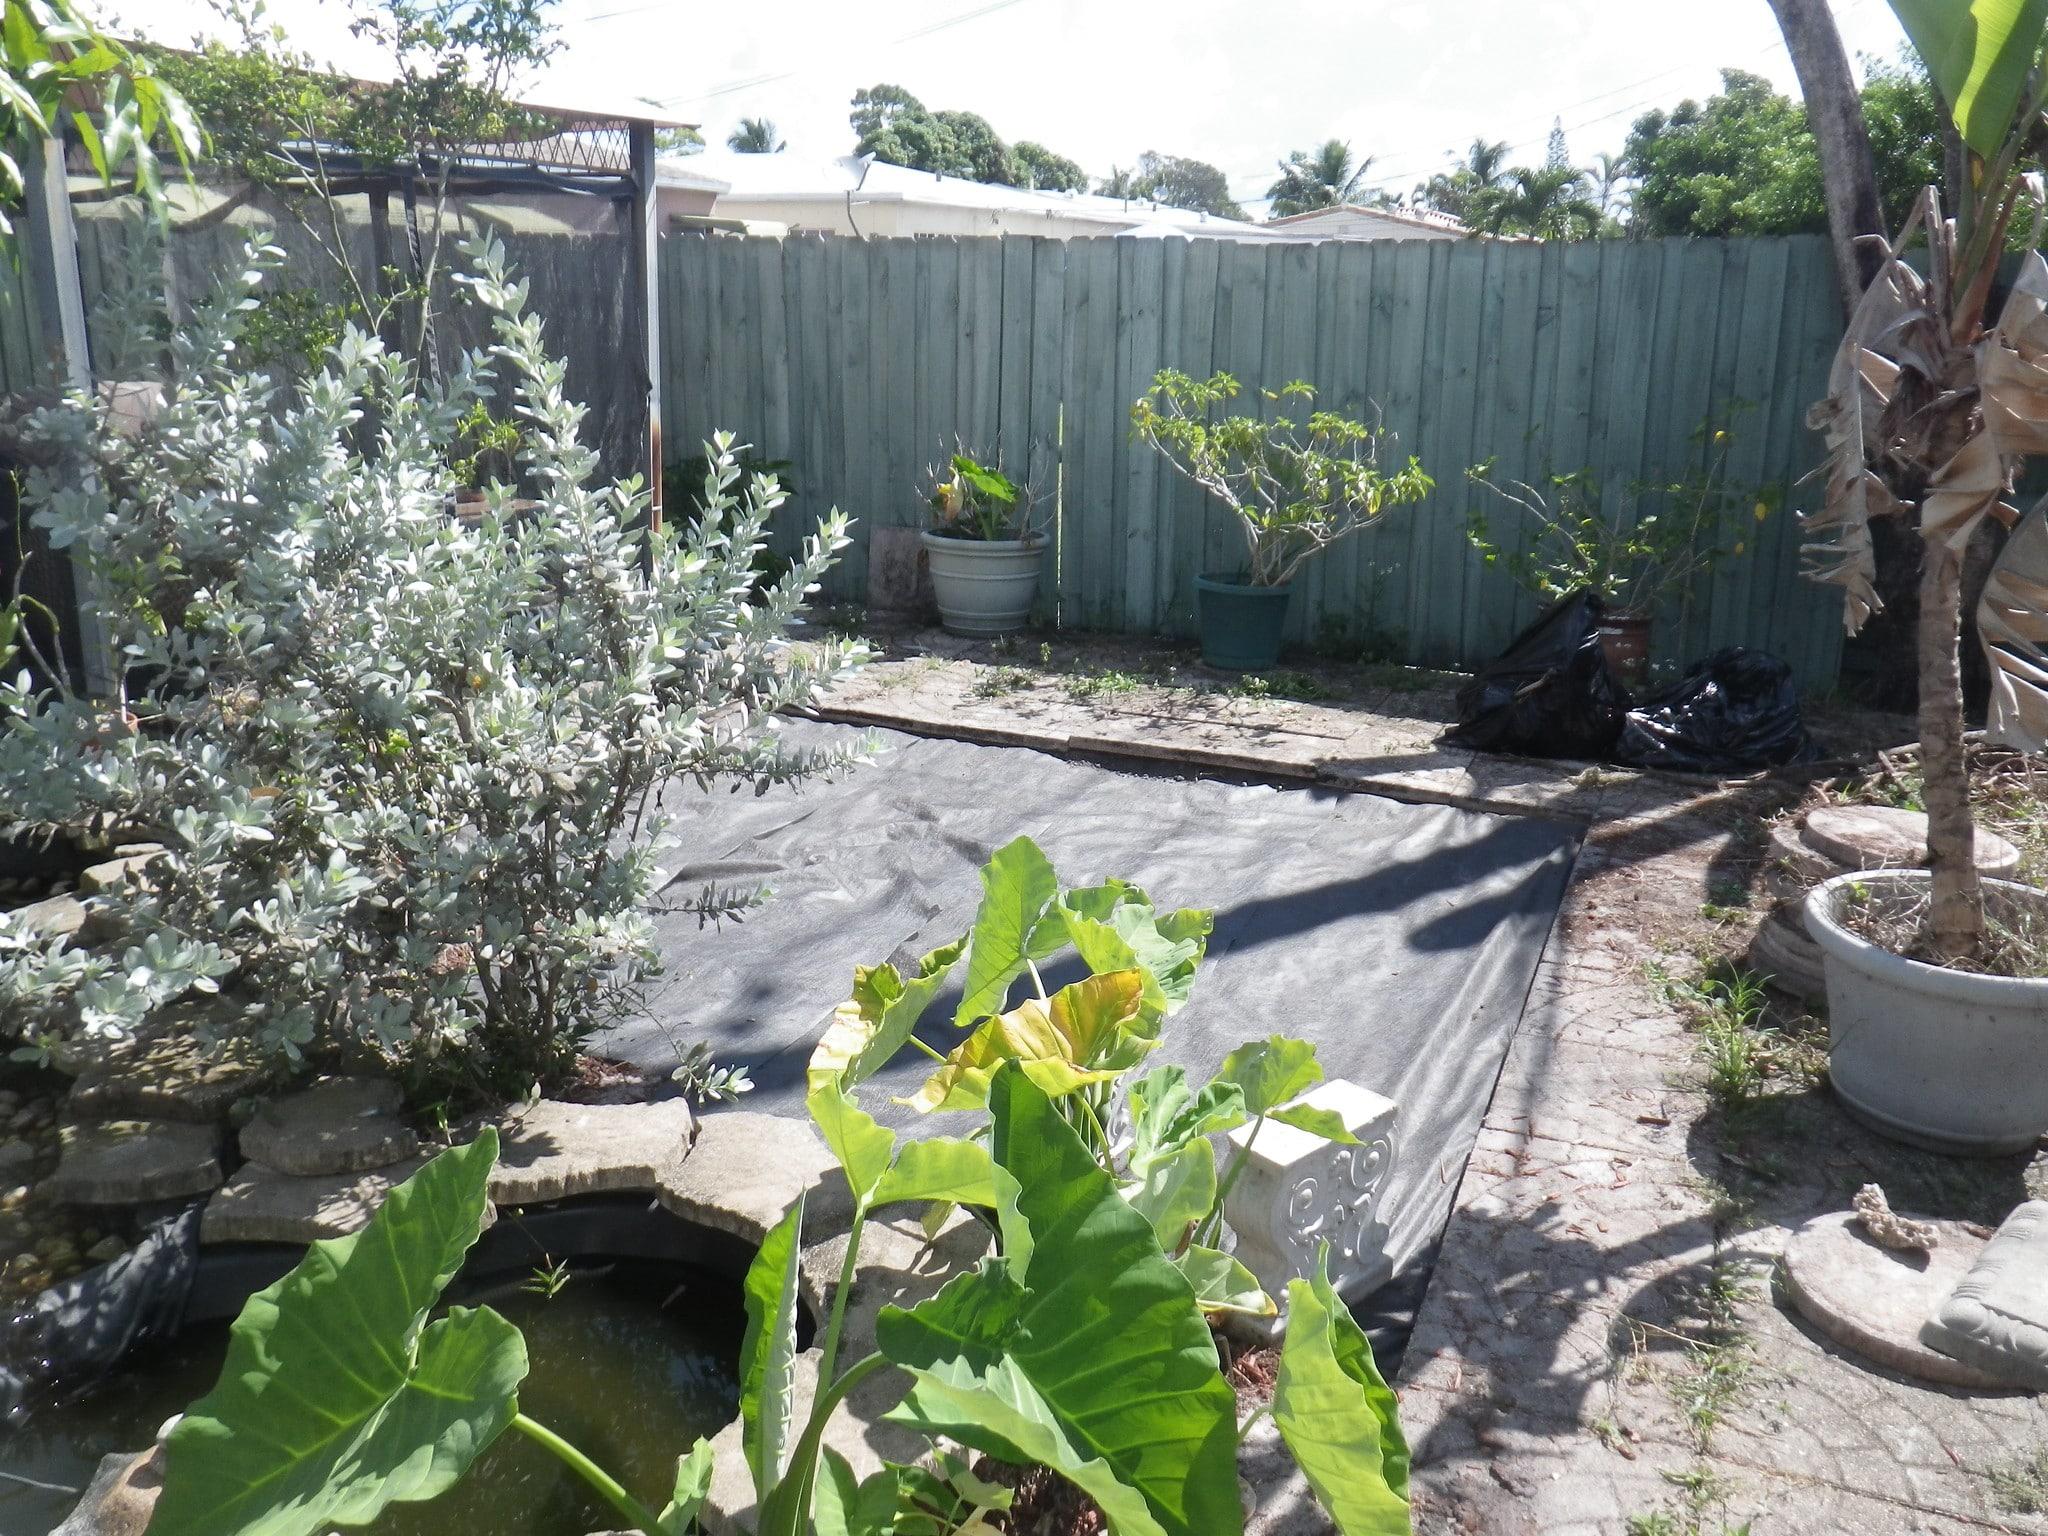 planting local vegetation